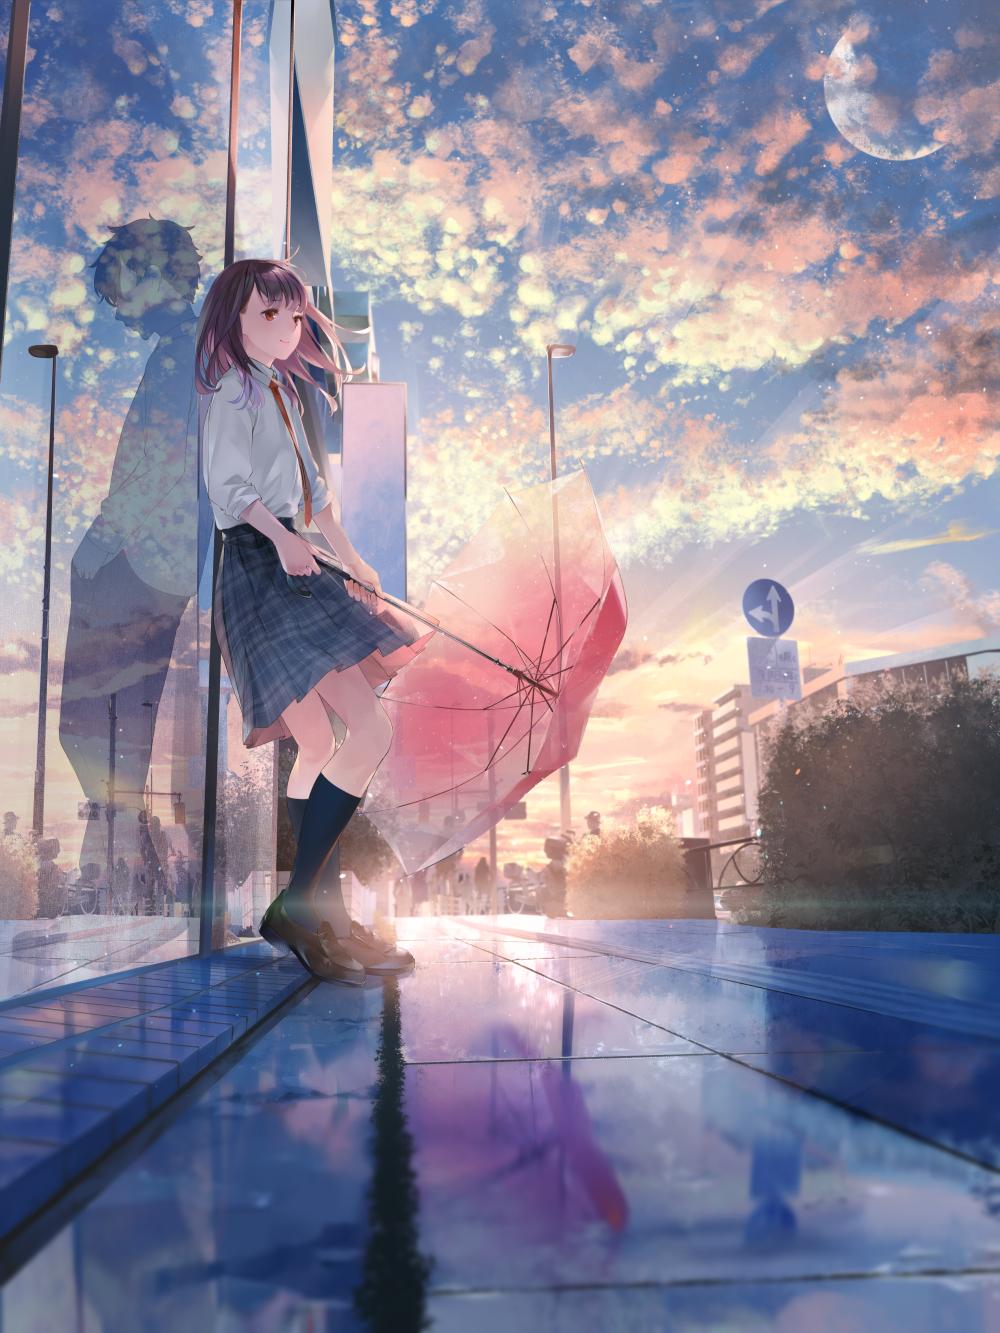 After Rain Original Anime Scenery Anime Art Girl Anime Art Beautiful